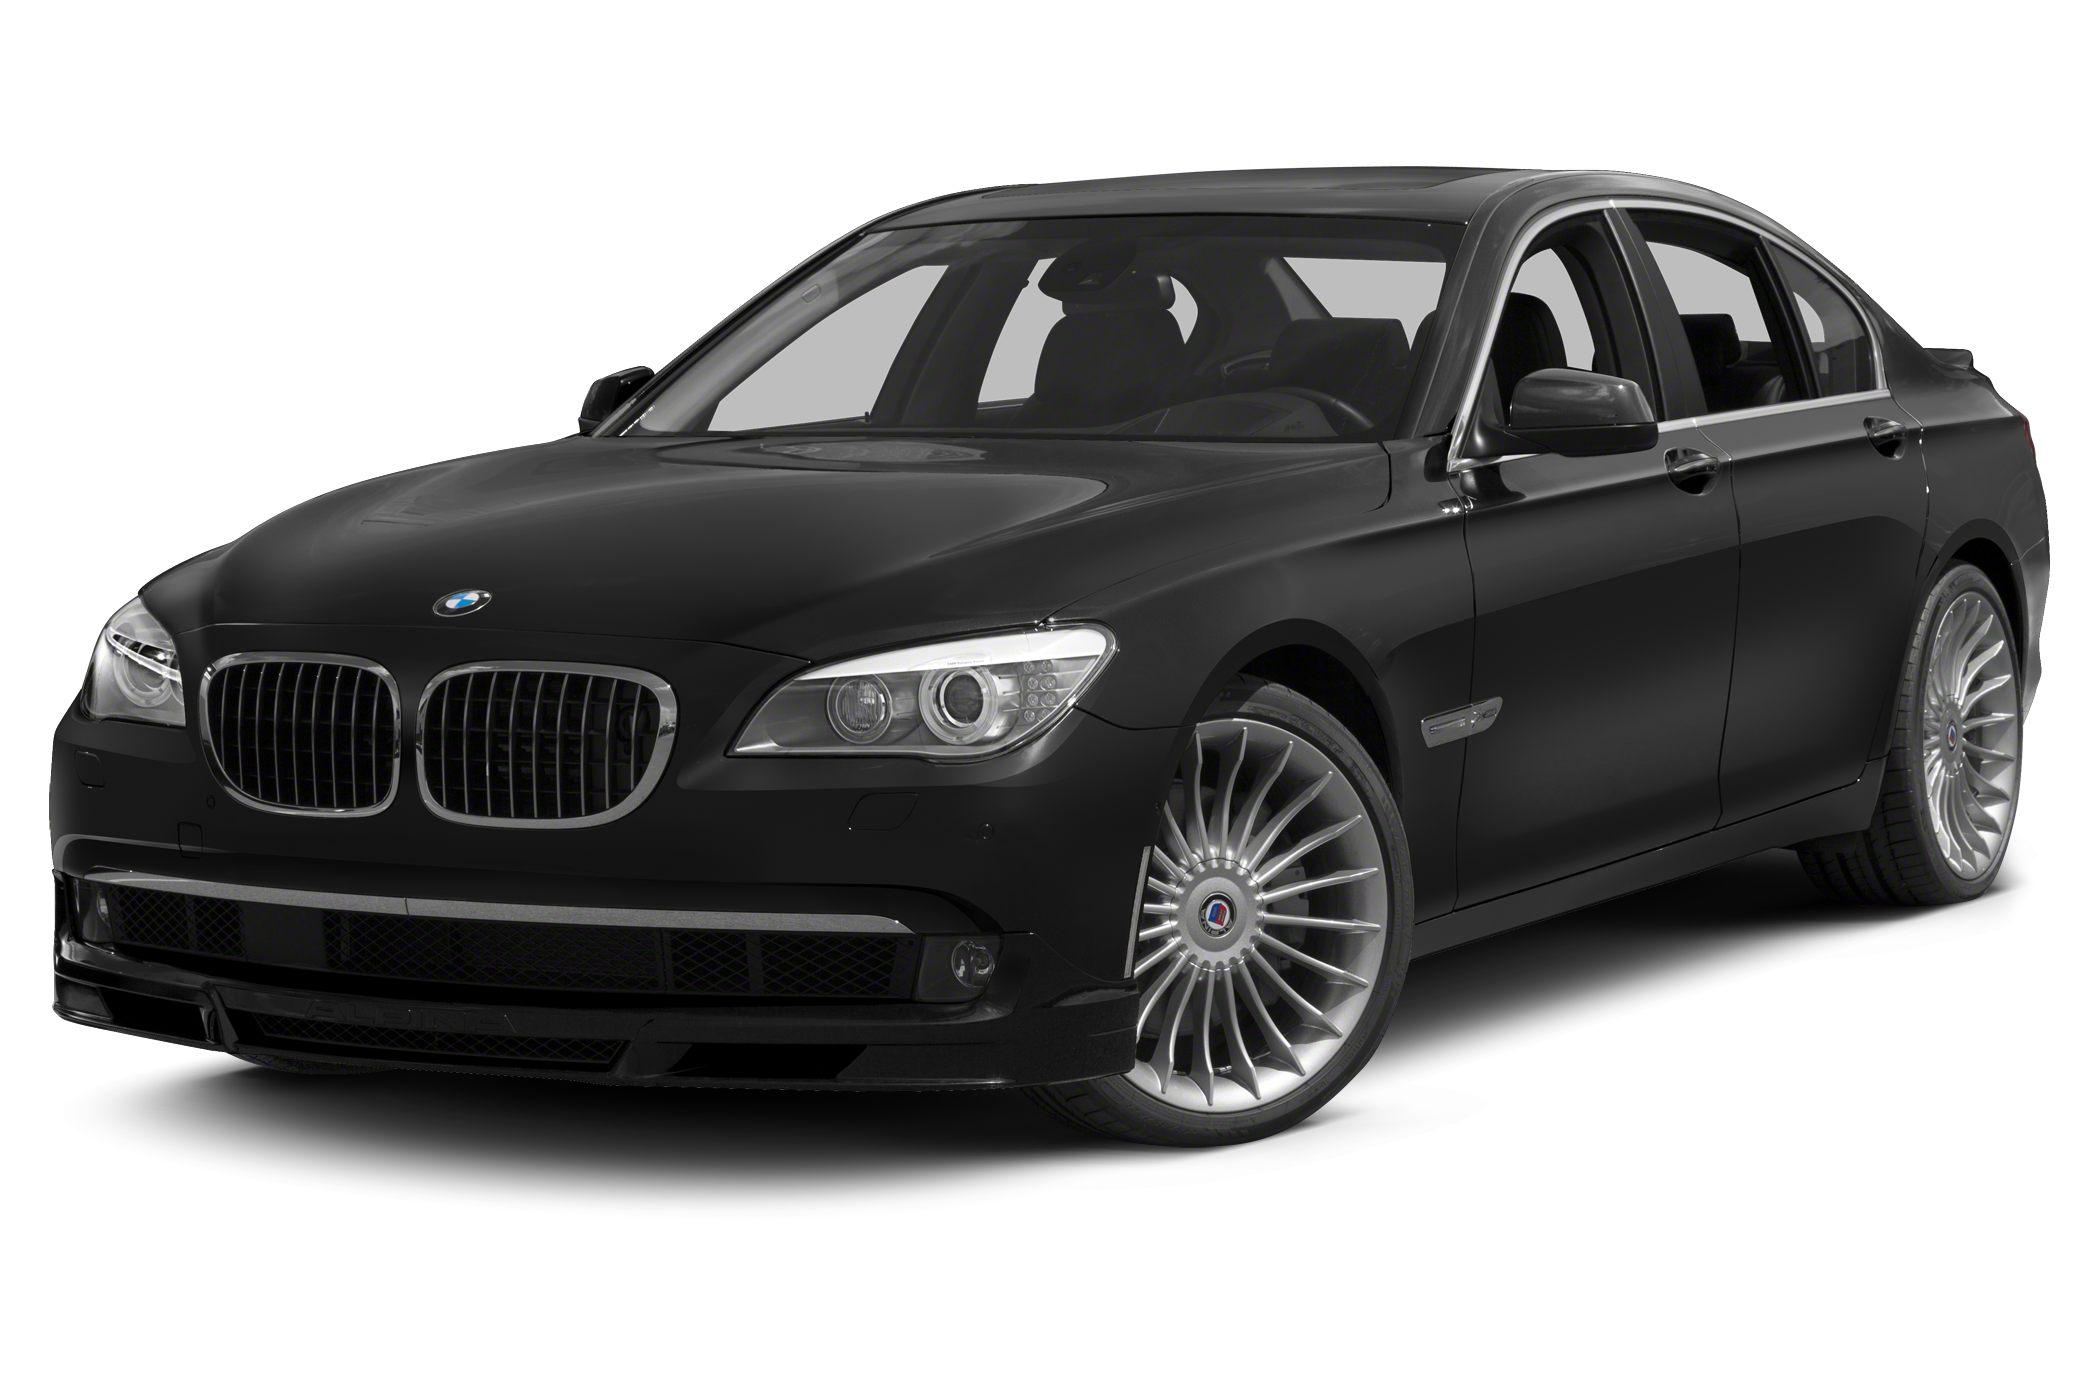 BMW ALPINA B7 2011